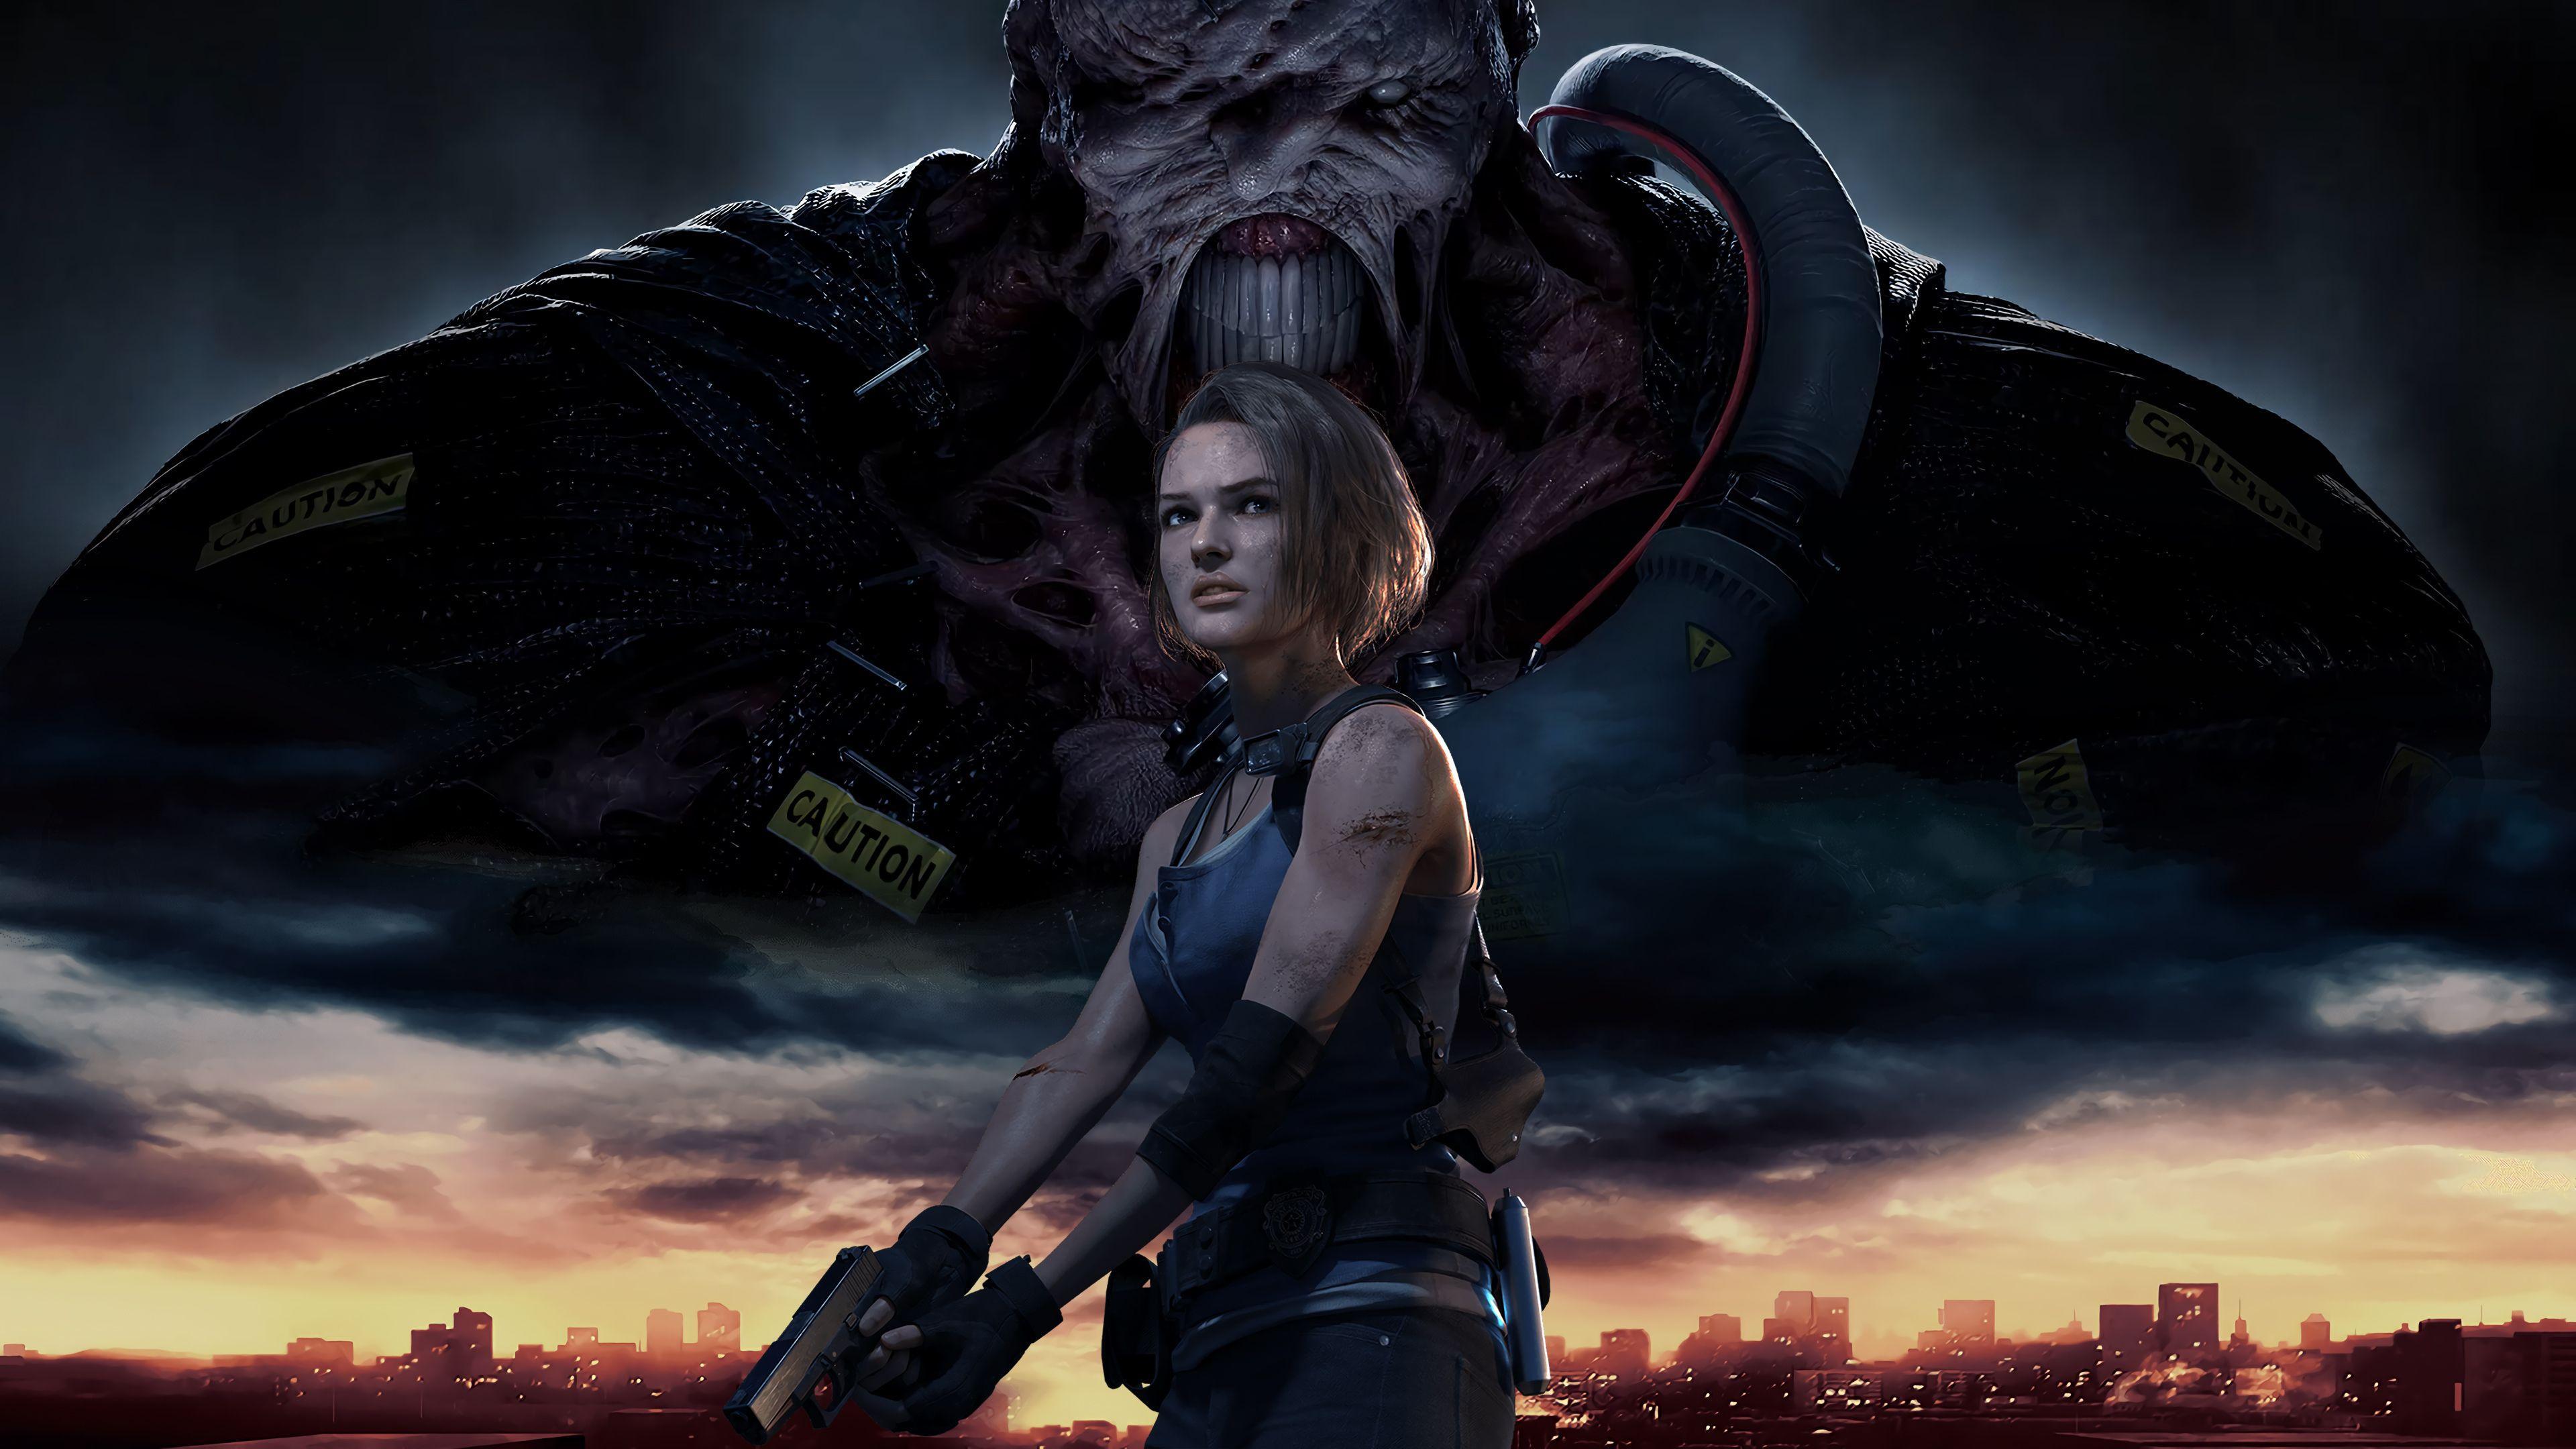 Resident Evil 3 Remake Wallpapers Top Free Resident Evil 3